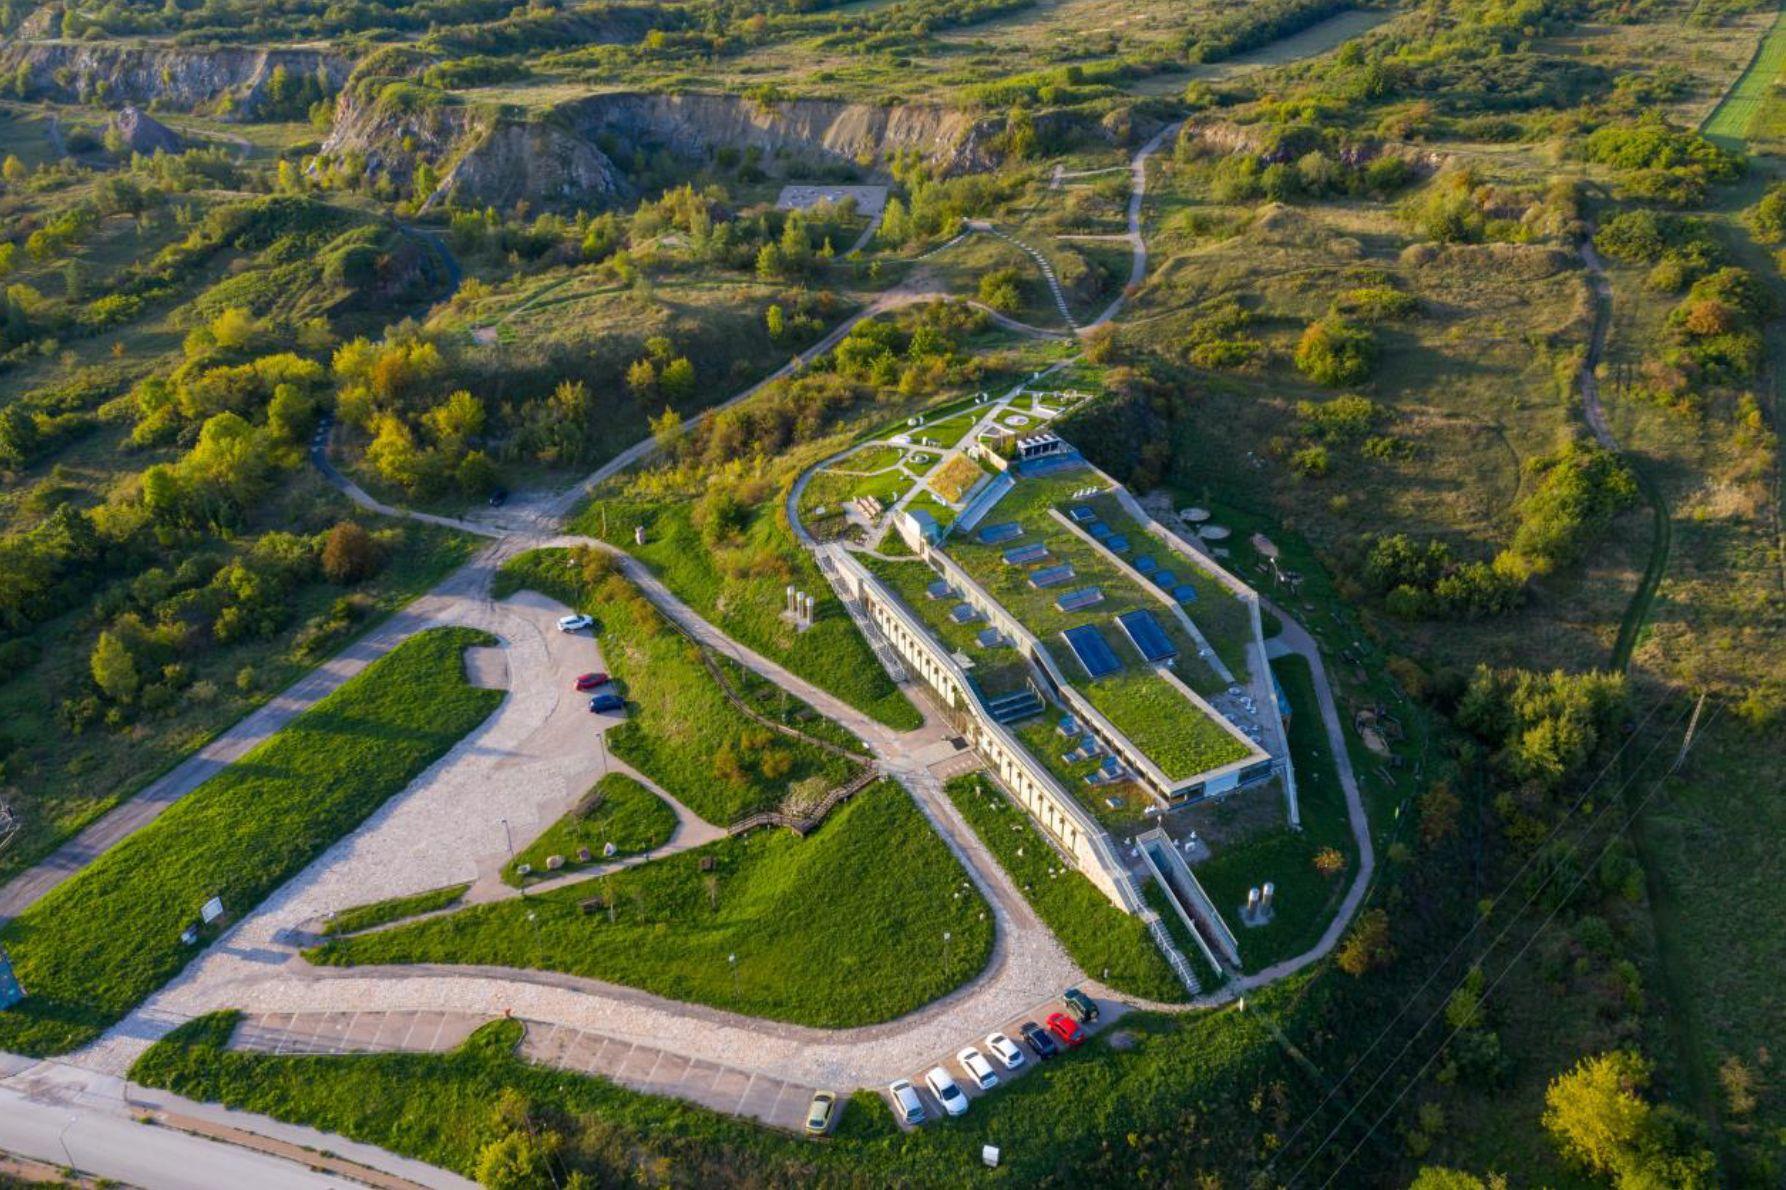 Geopark Kielce